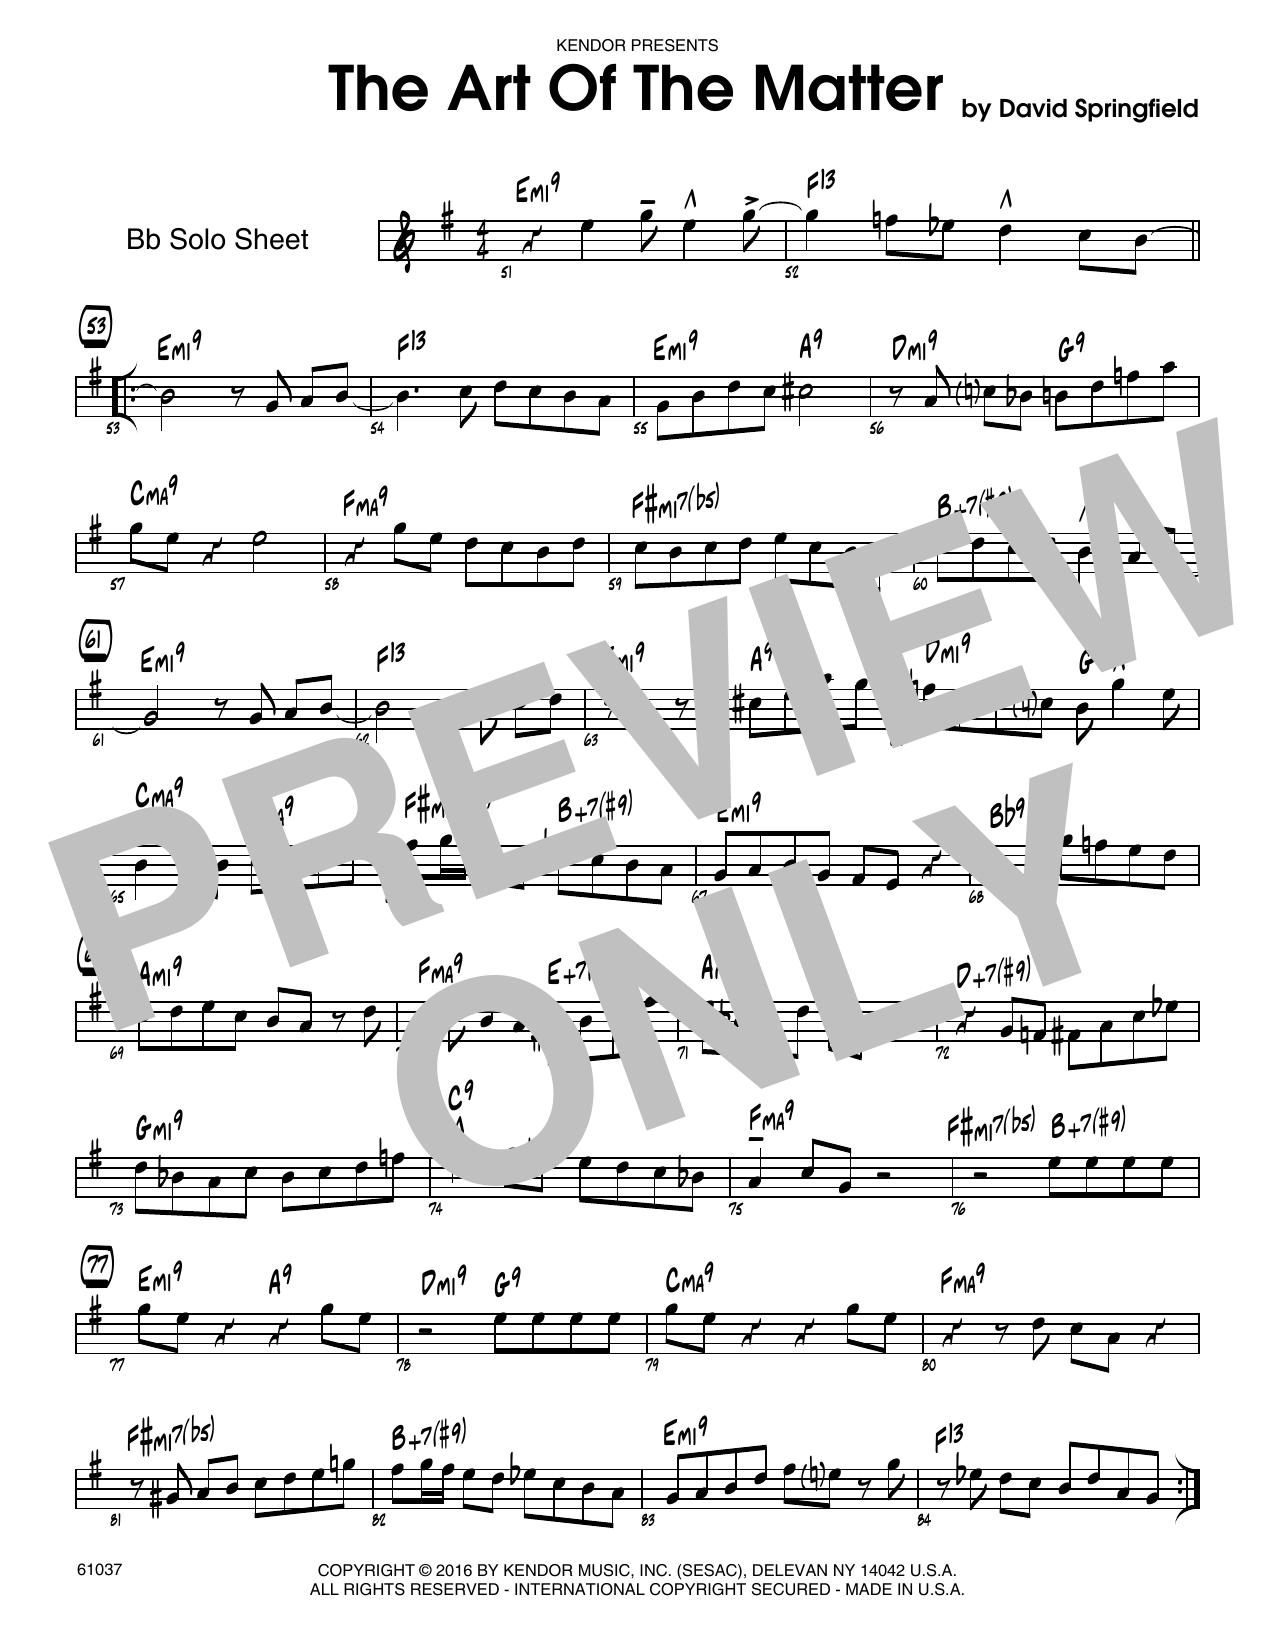 The Art Of The Matter - Solo Sheet - Tenor Sax Sheet Music